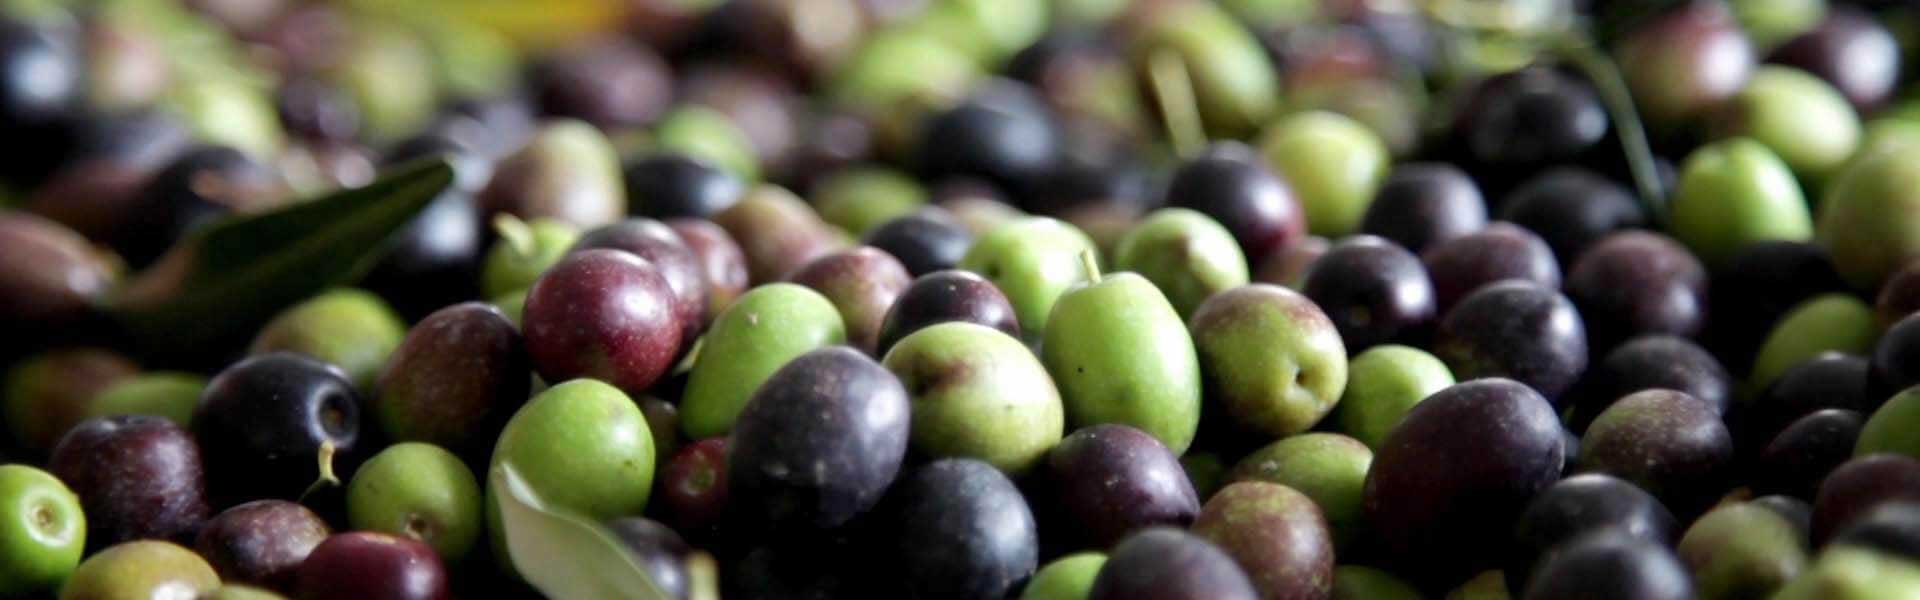 Señoríos de Relleu fresh olives at harvestime